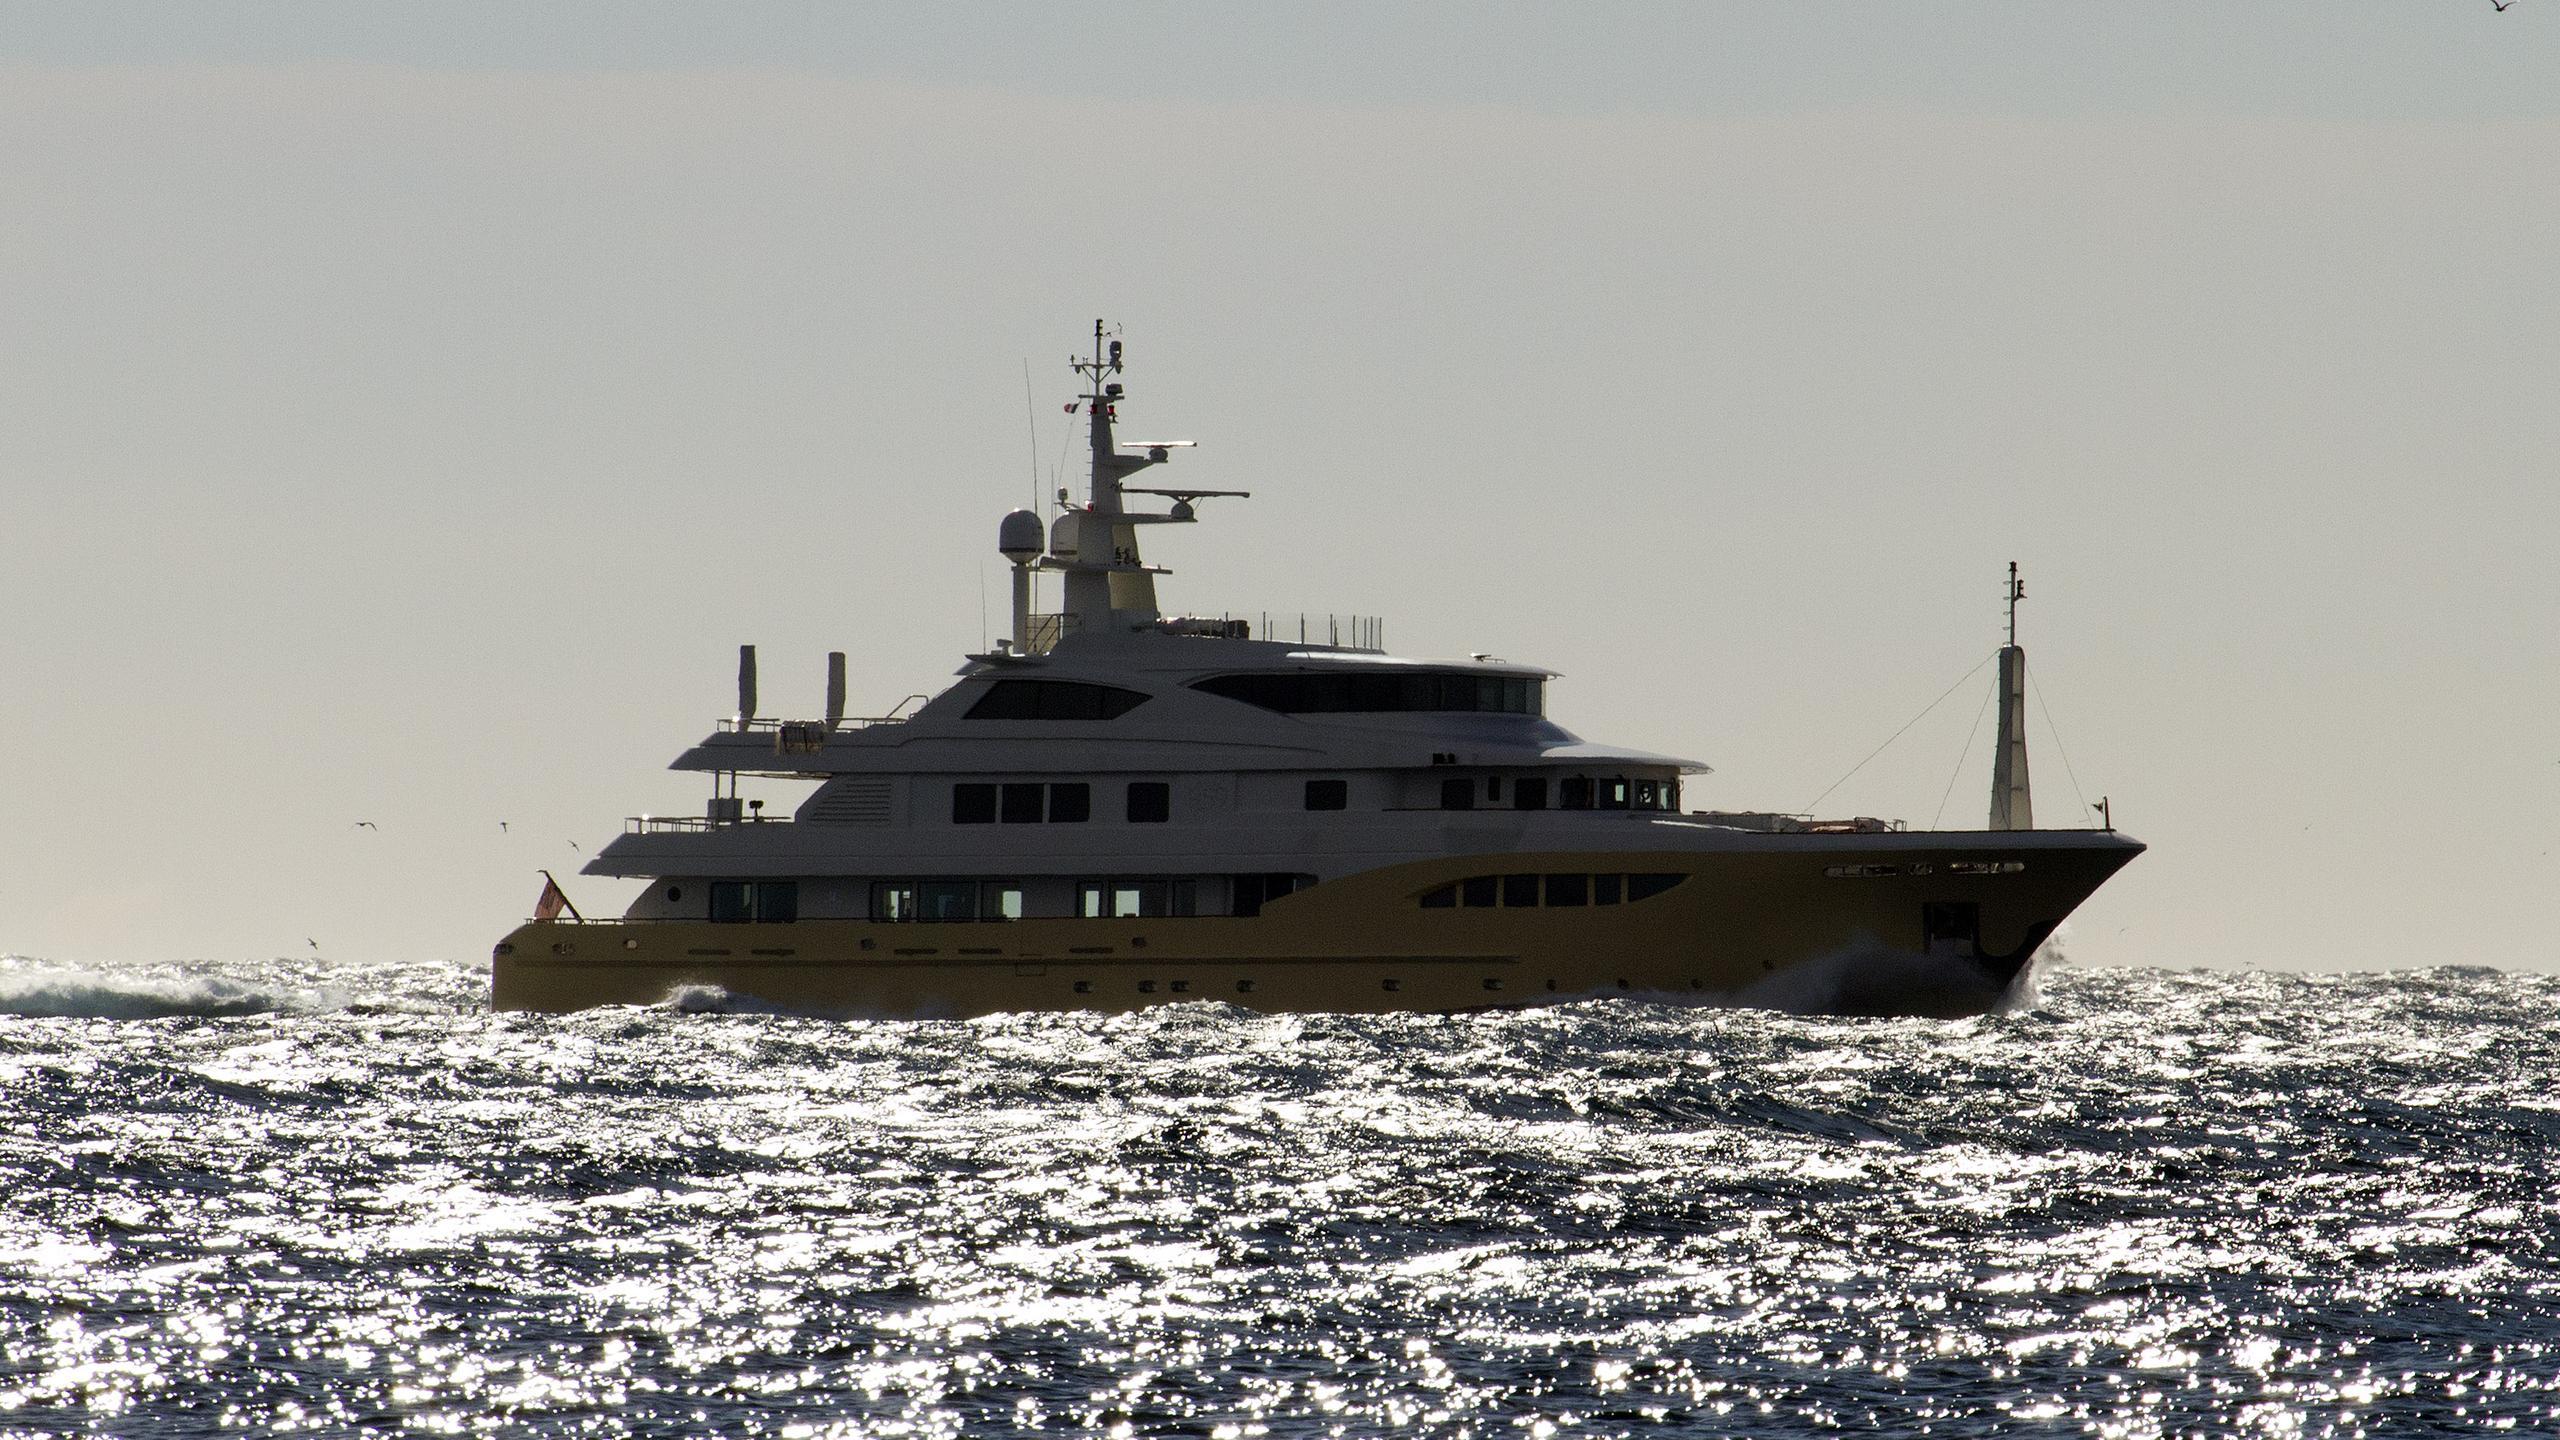 jade-959-bandido-170-explorer-yacht-2014-52m-running-half-profile